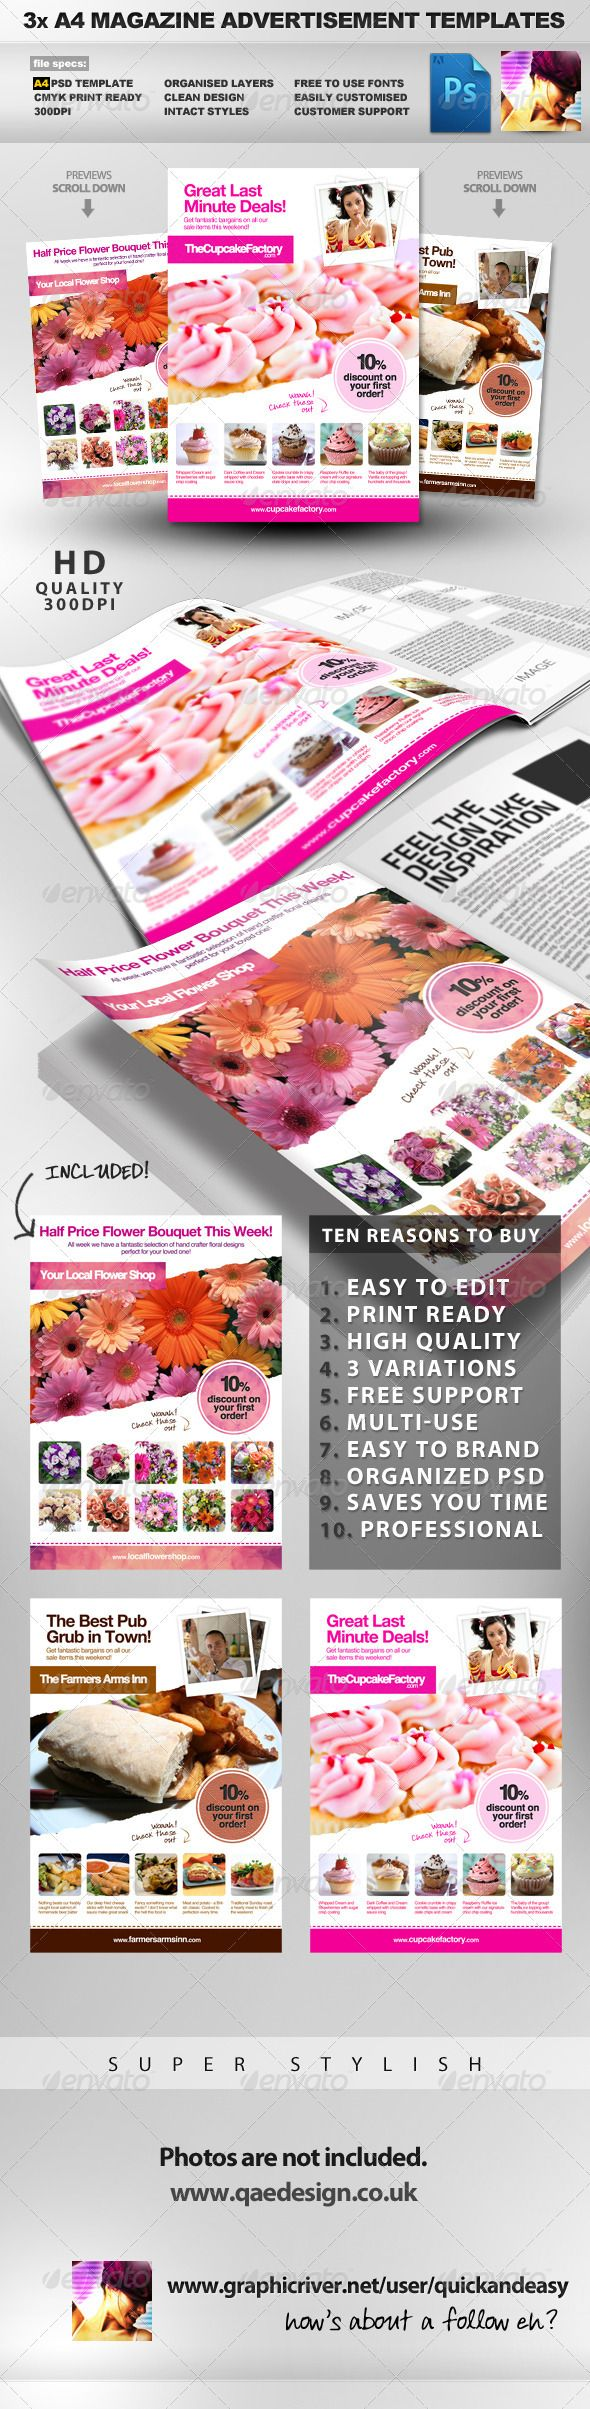 free magazine advertisement template